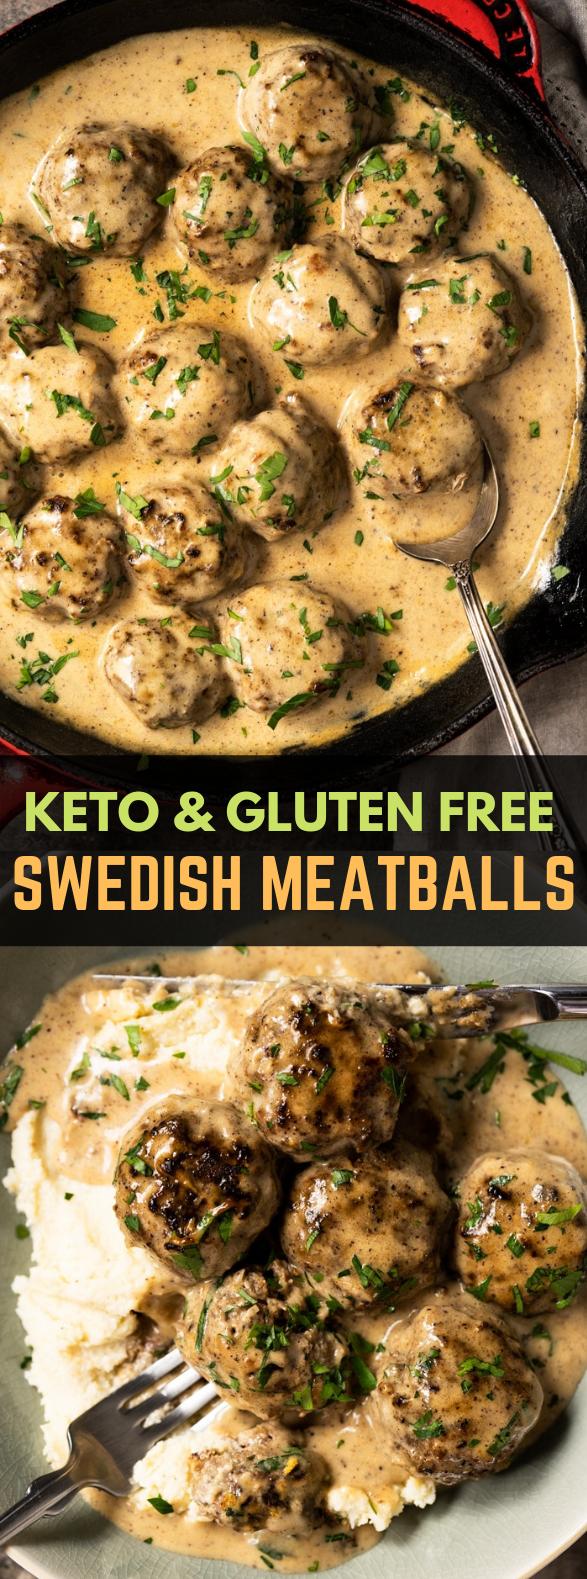 GLUTEN FREE & KETO SWEDISH MEATBALLS #familyrecipes #ketogenic